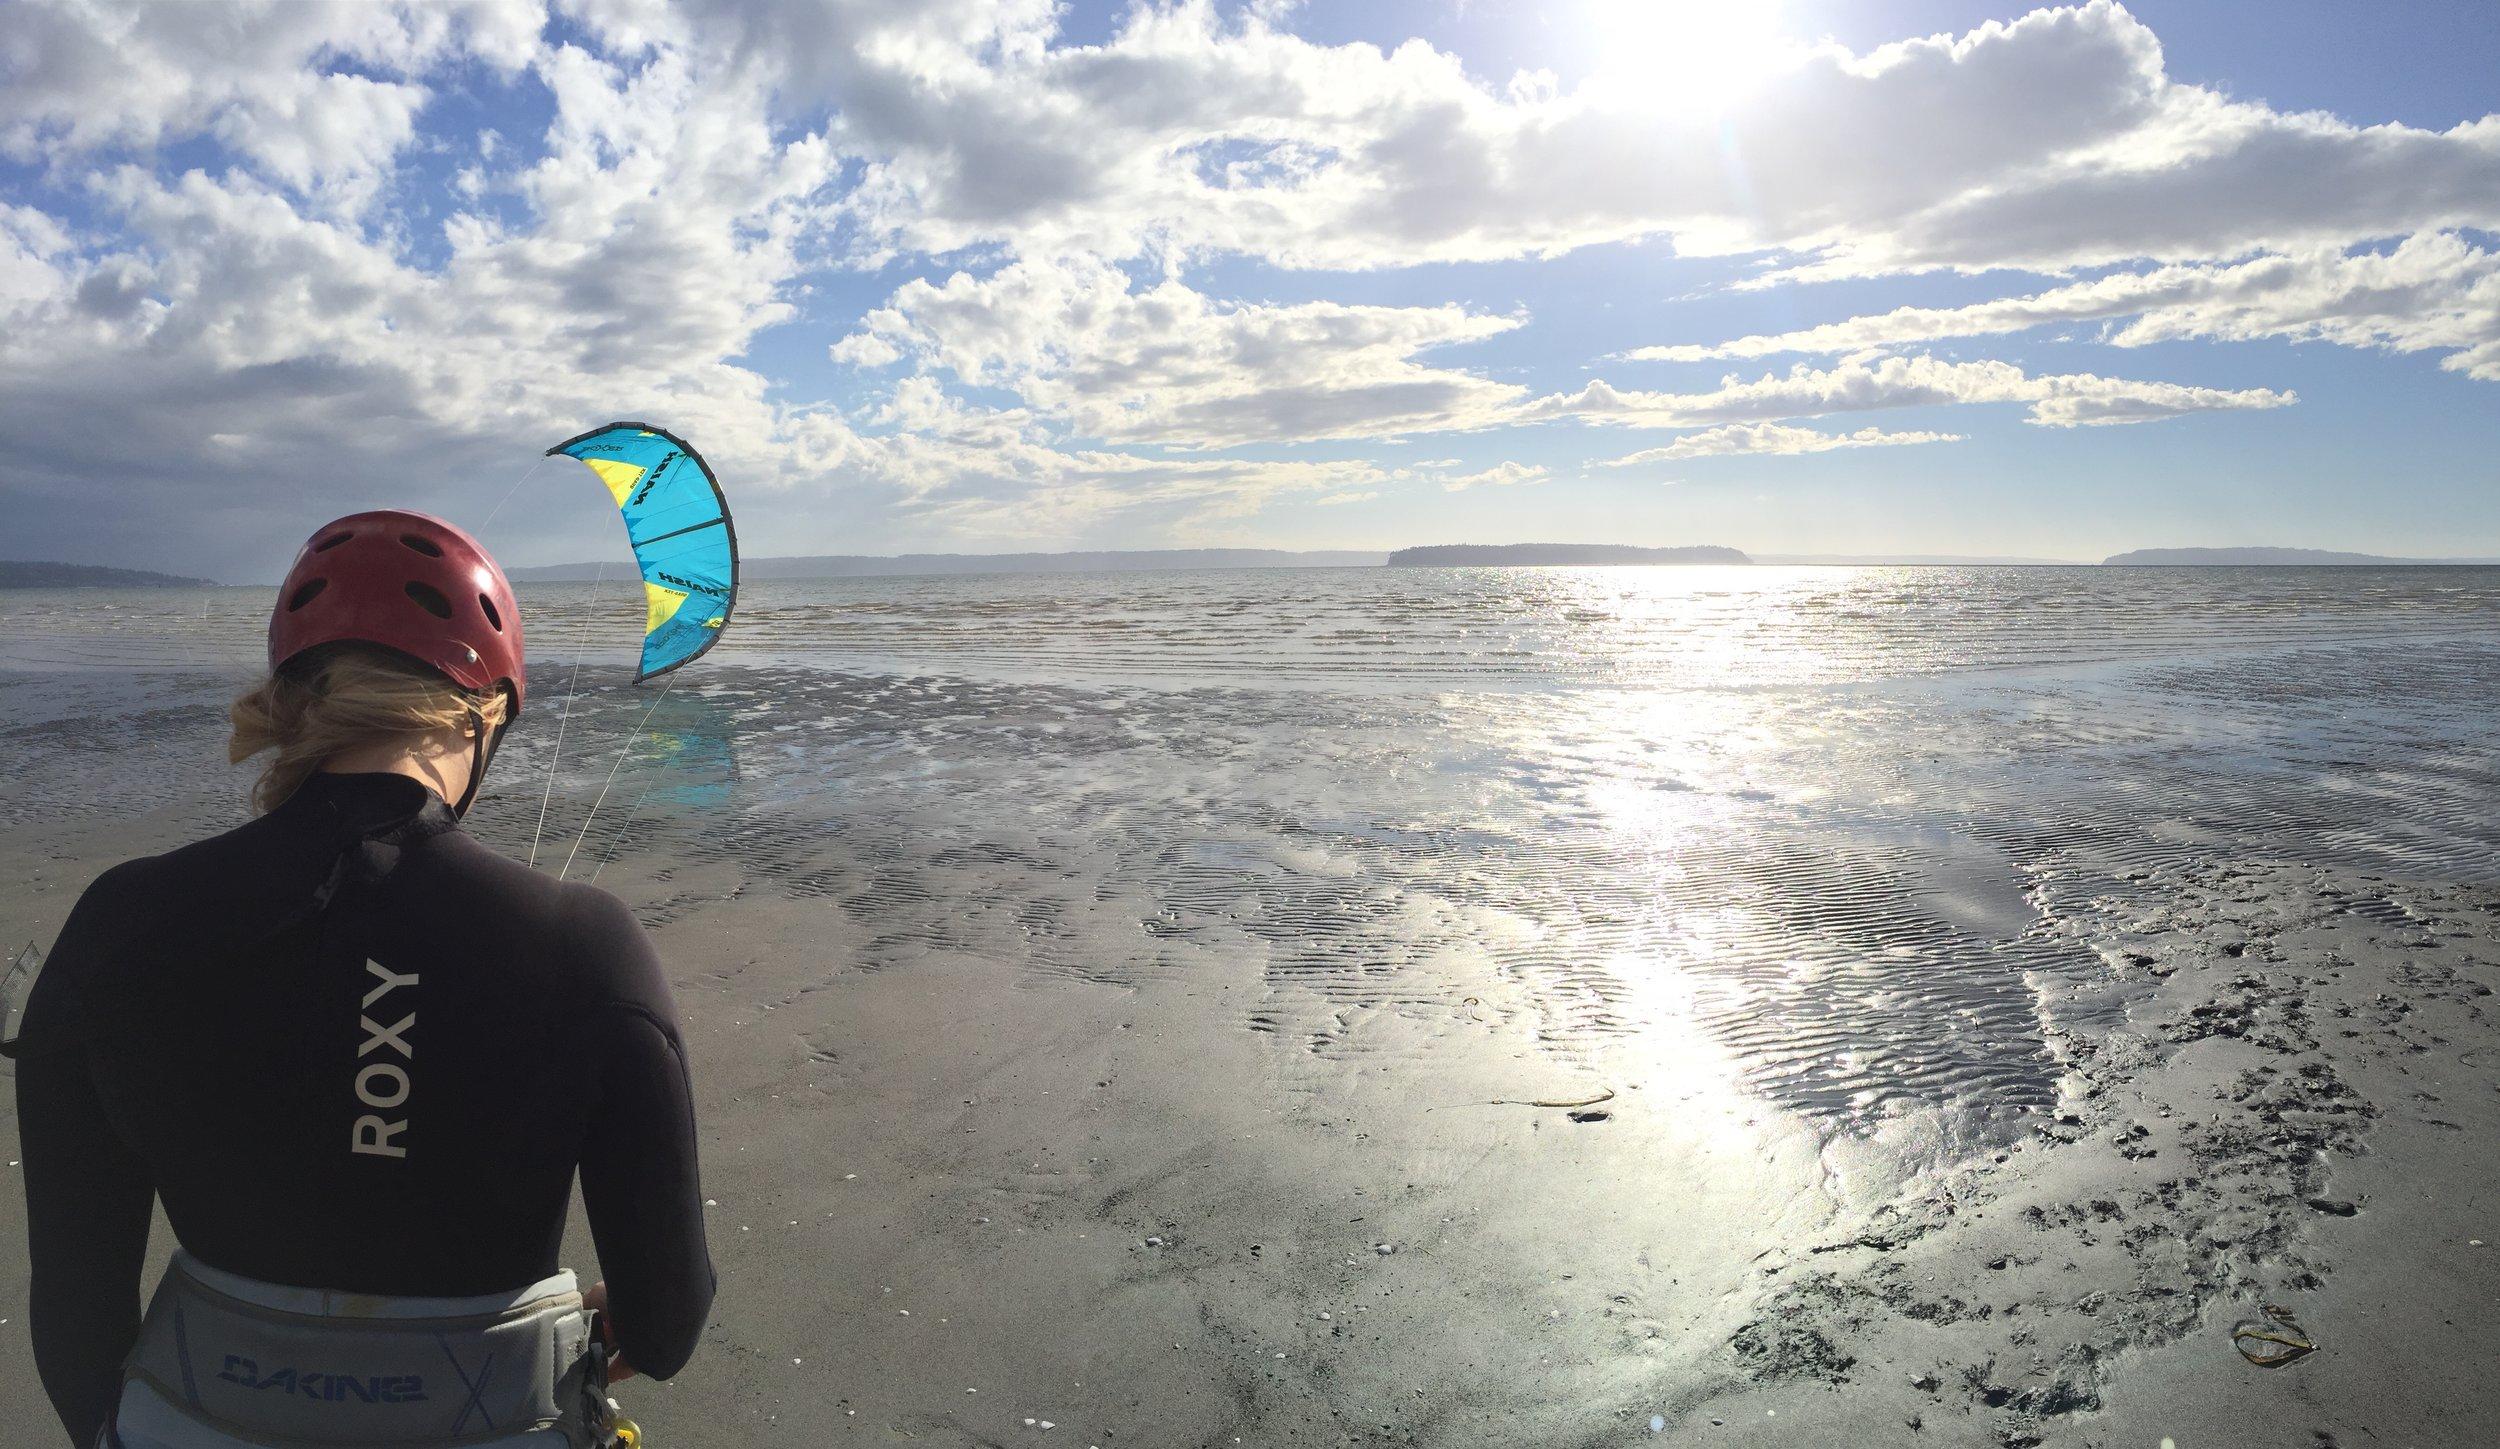 Level 1 + Level 2 Kitesurfing Lesson at Jetty Island Everett Washington